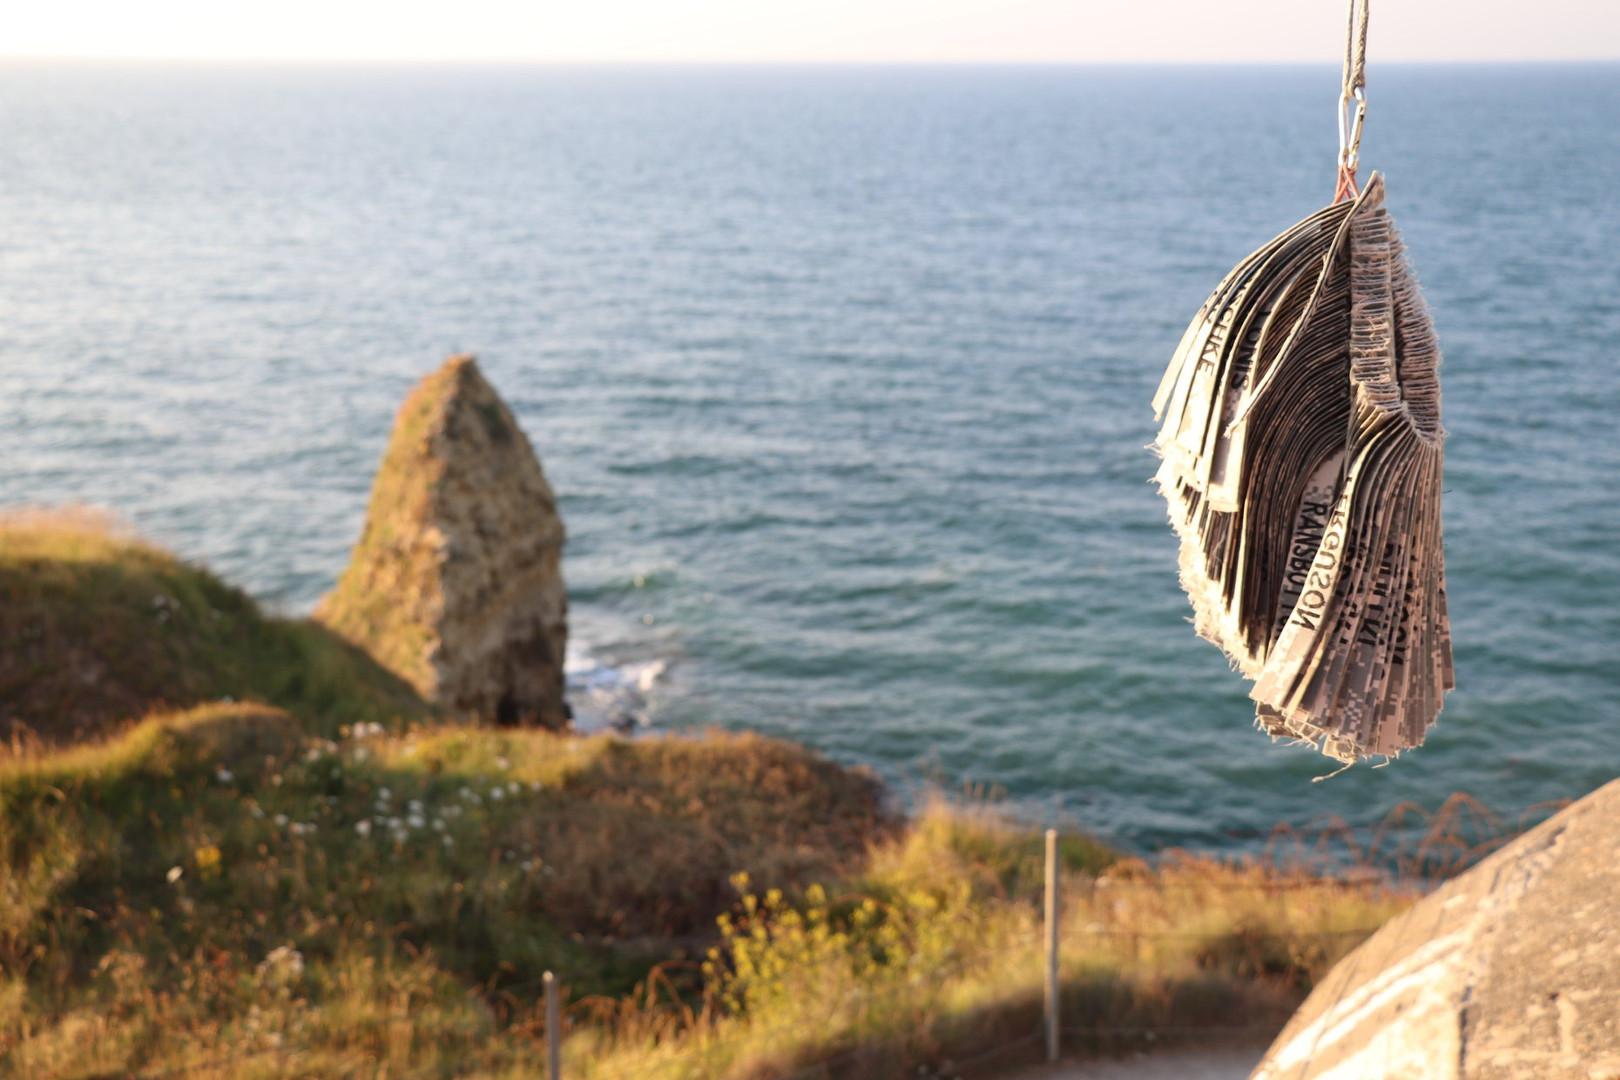 Pointe du Hoc sea